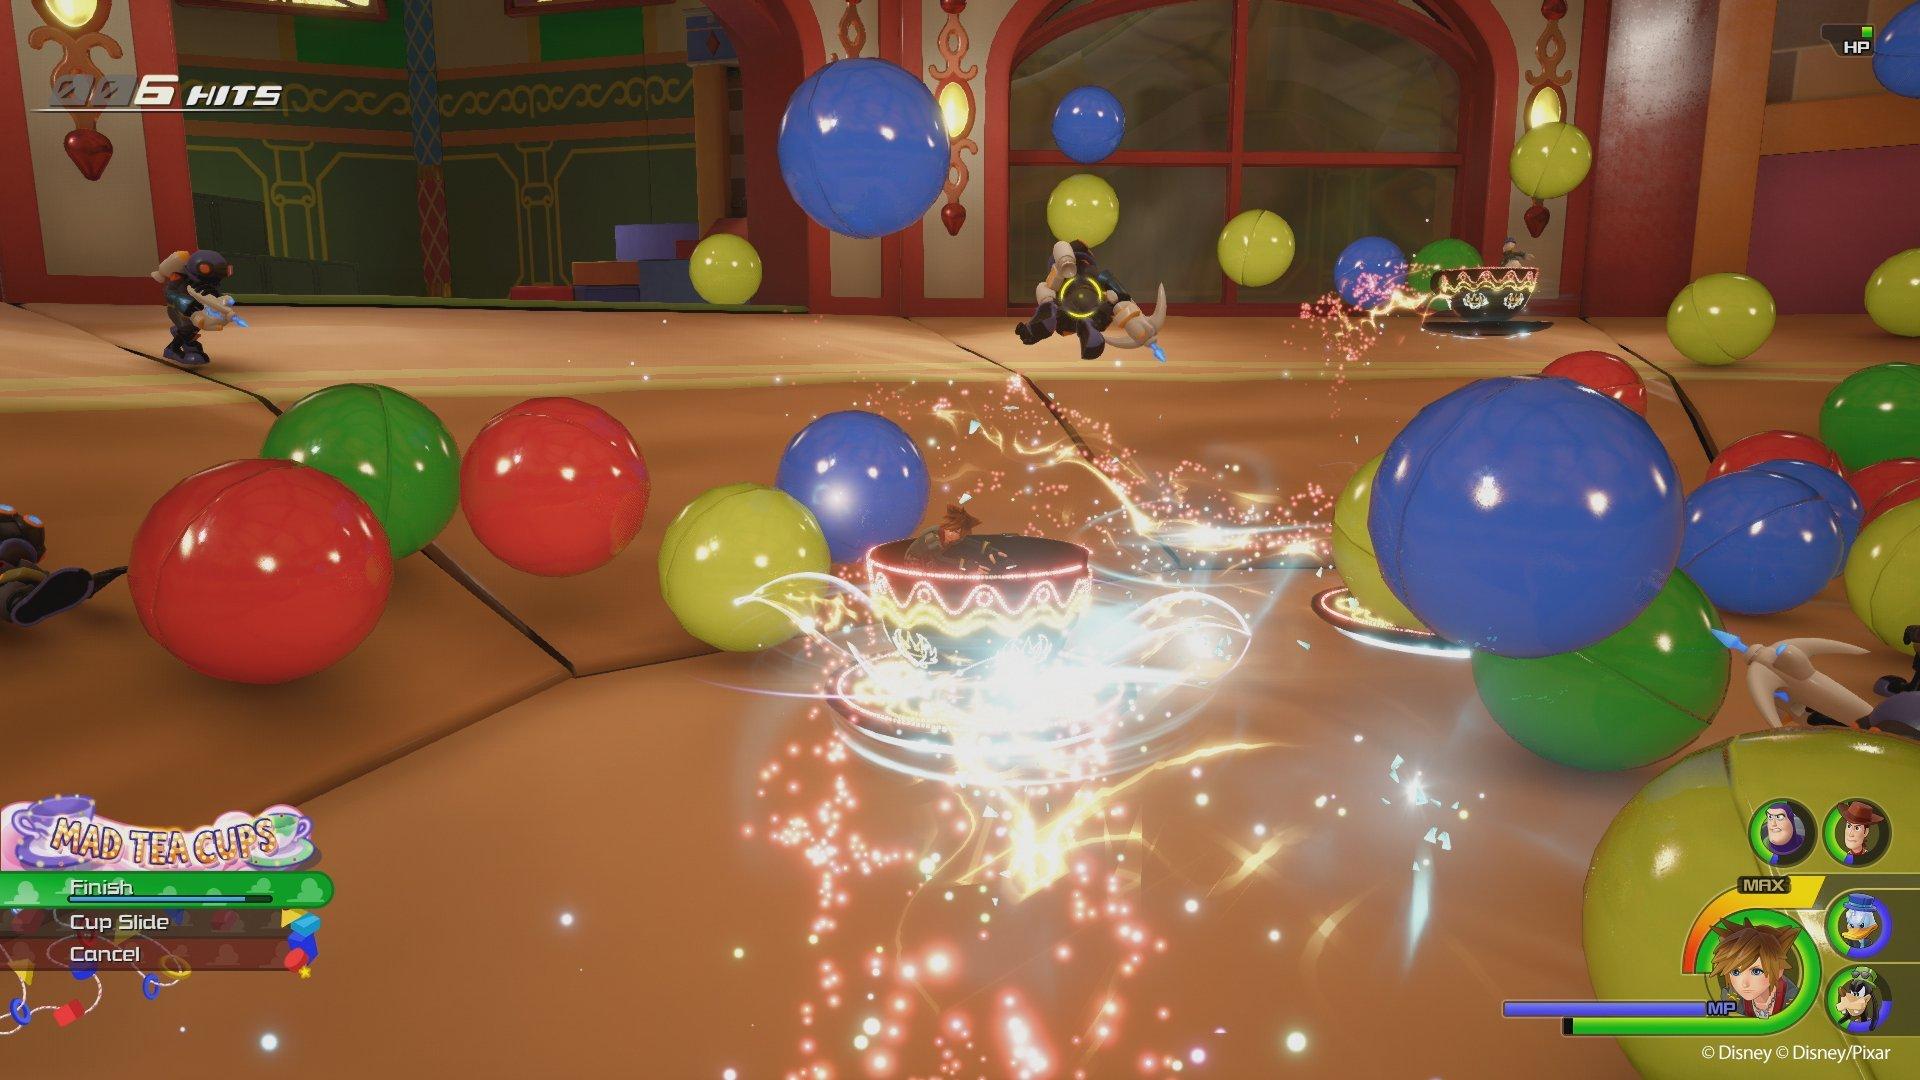 Kingdom Hearts III - Xbox One by Square Enix (Image #19)